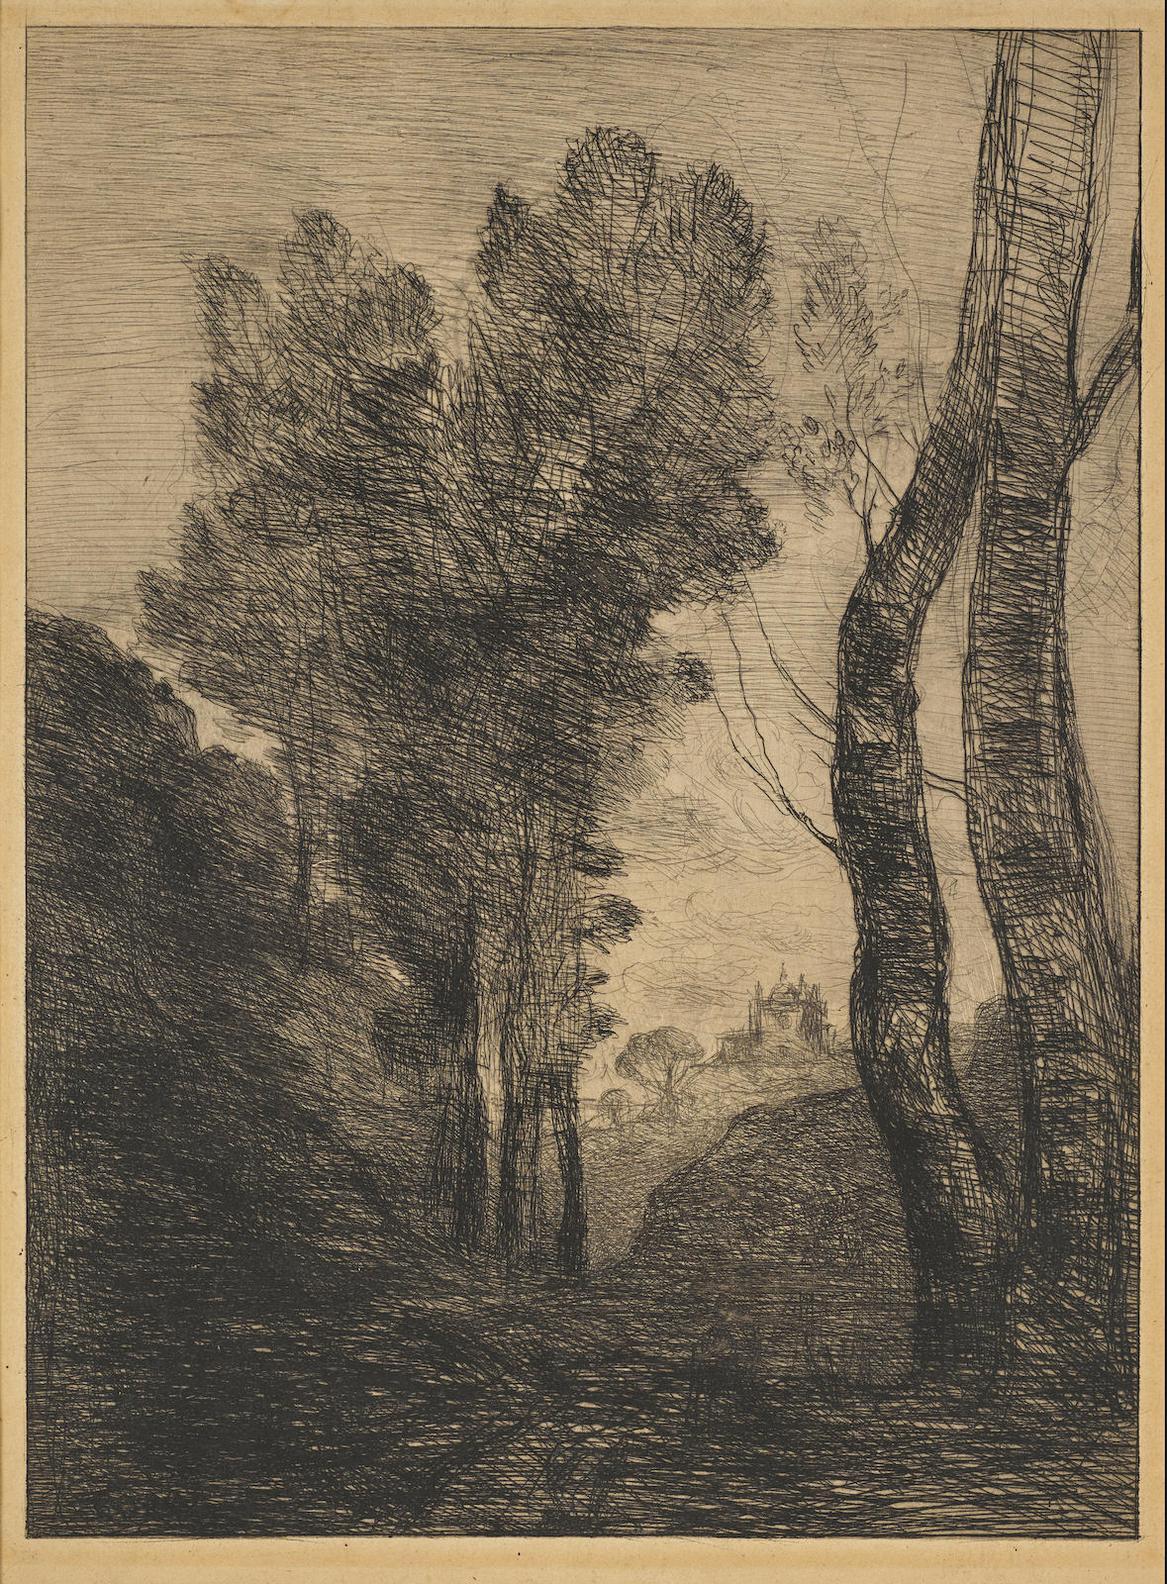 Jean-Baptiste-Camille Corot-Environs De Rome-1866